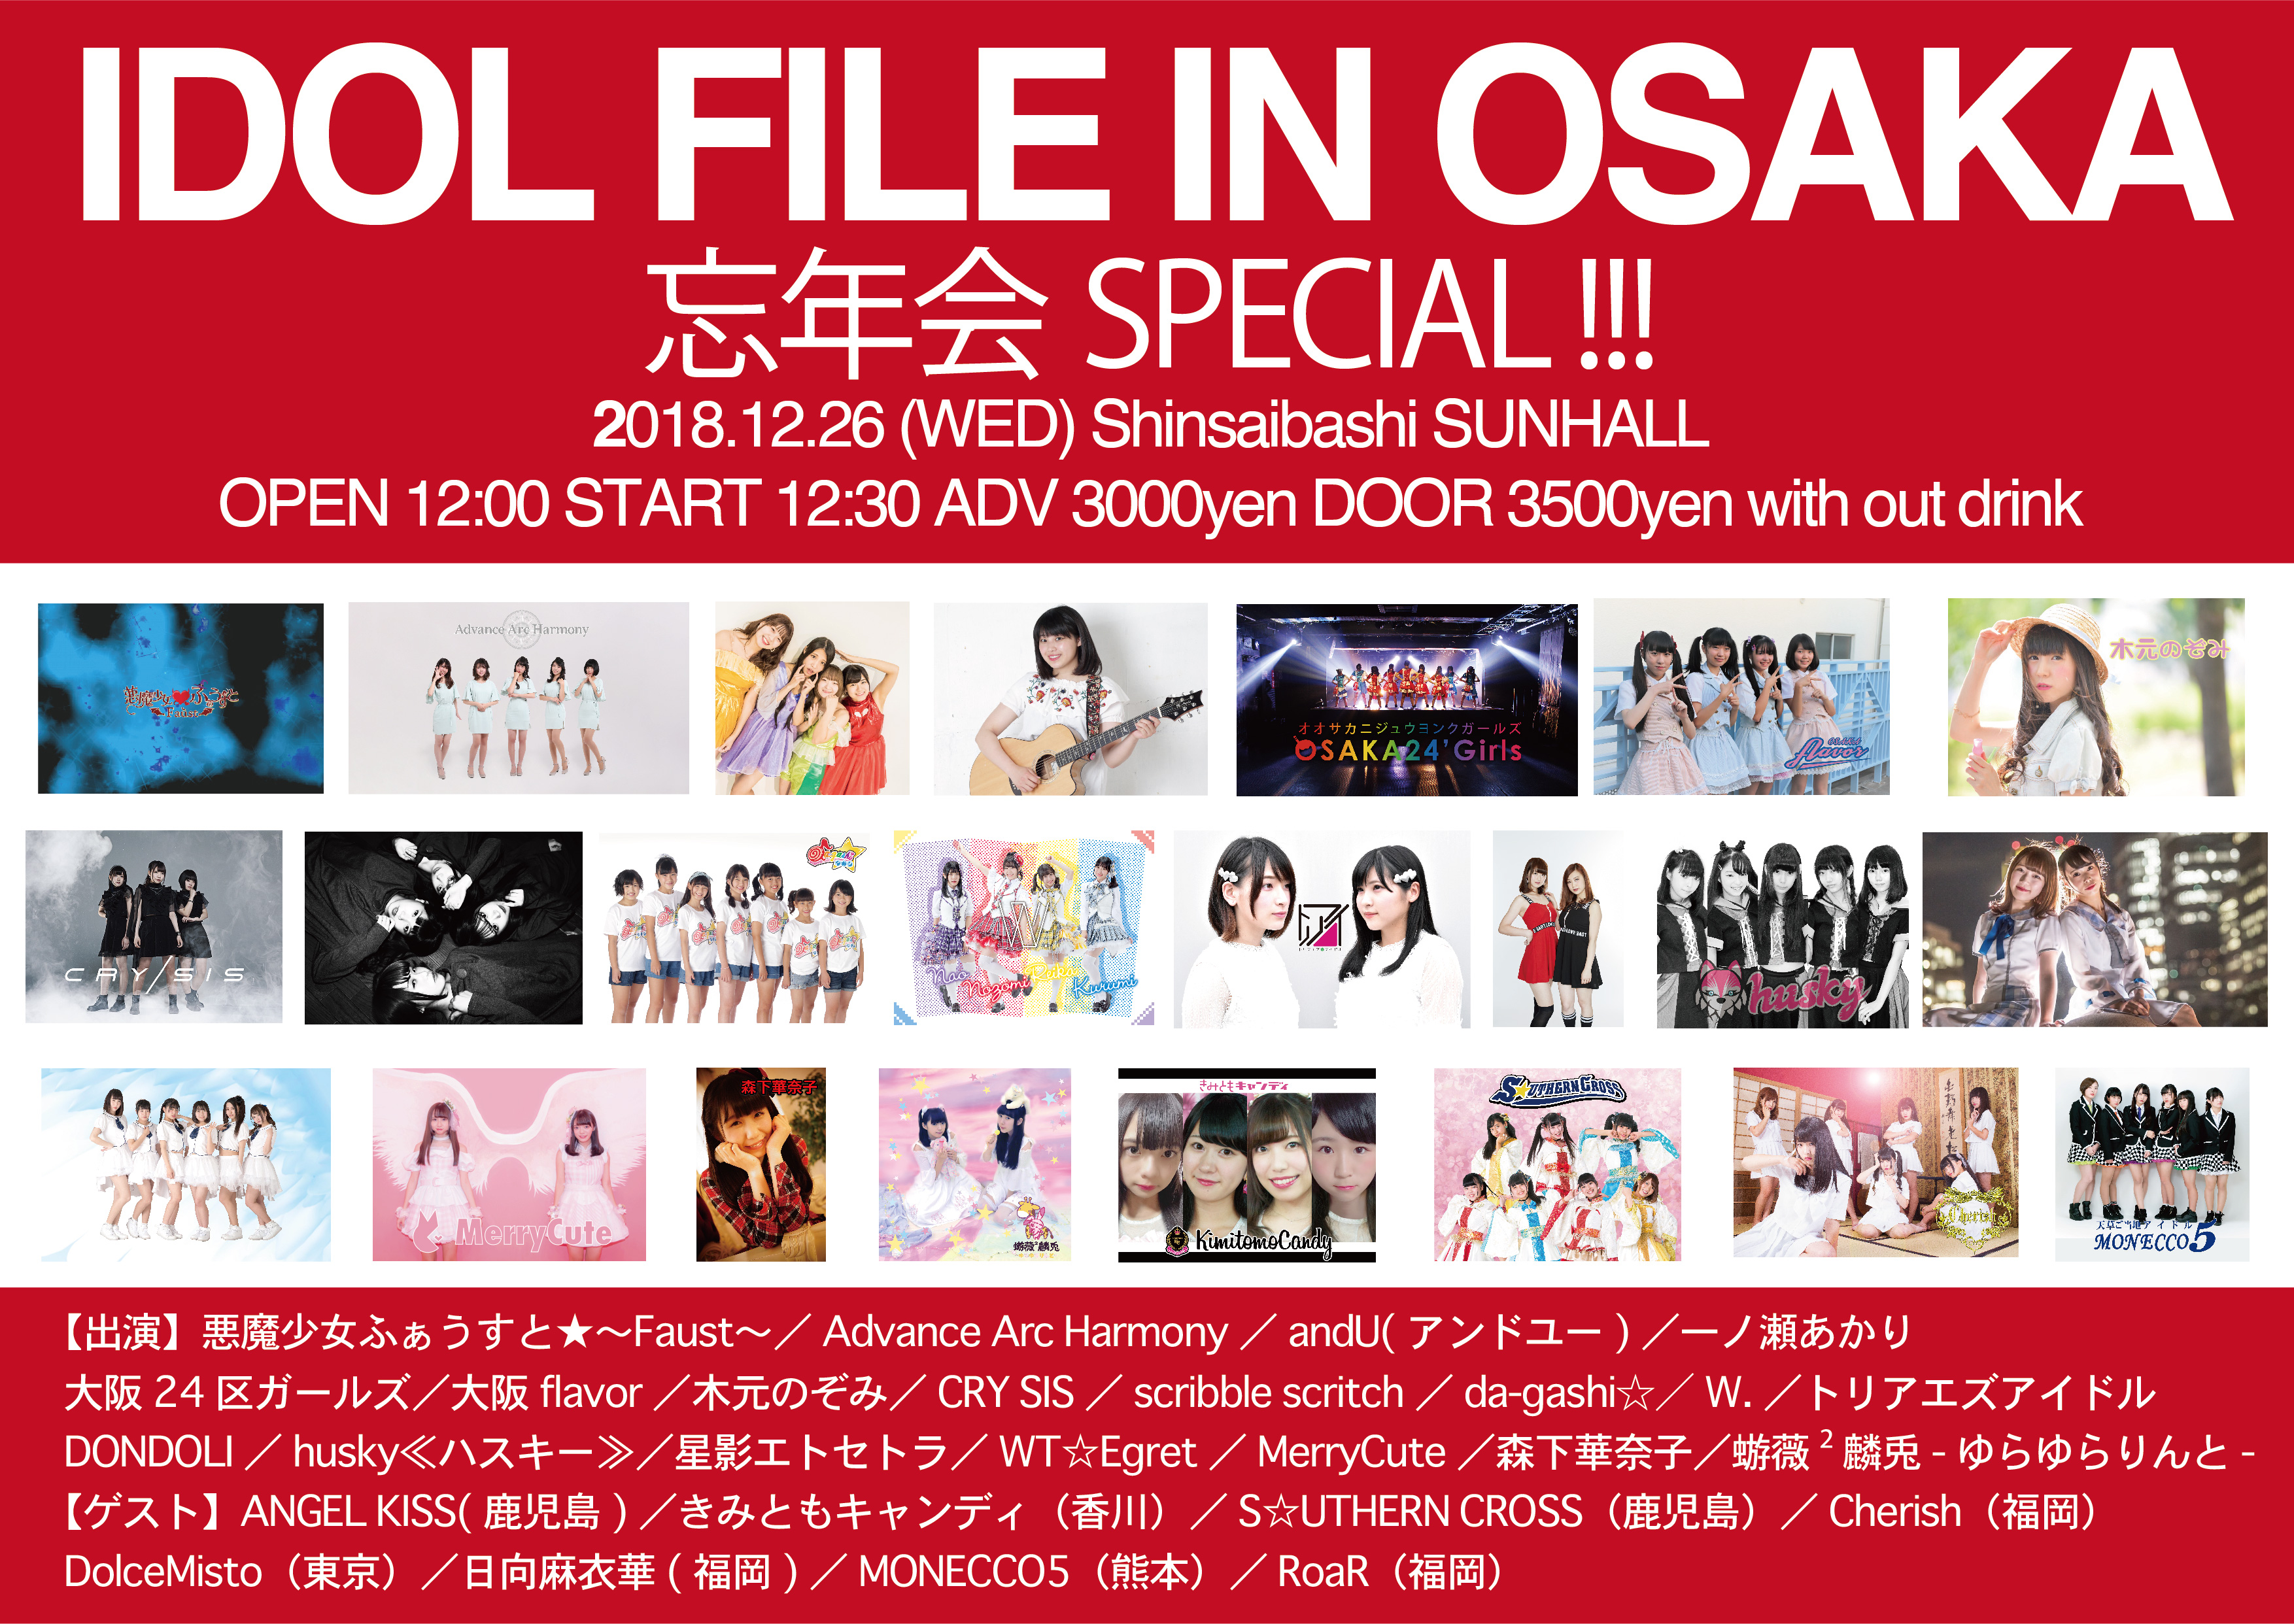 IDOL FILE IN OSAKA 忘年会SPECIAL!!! day.1